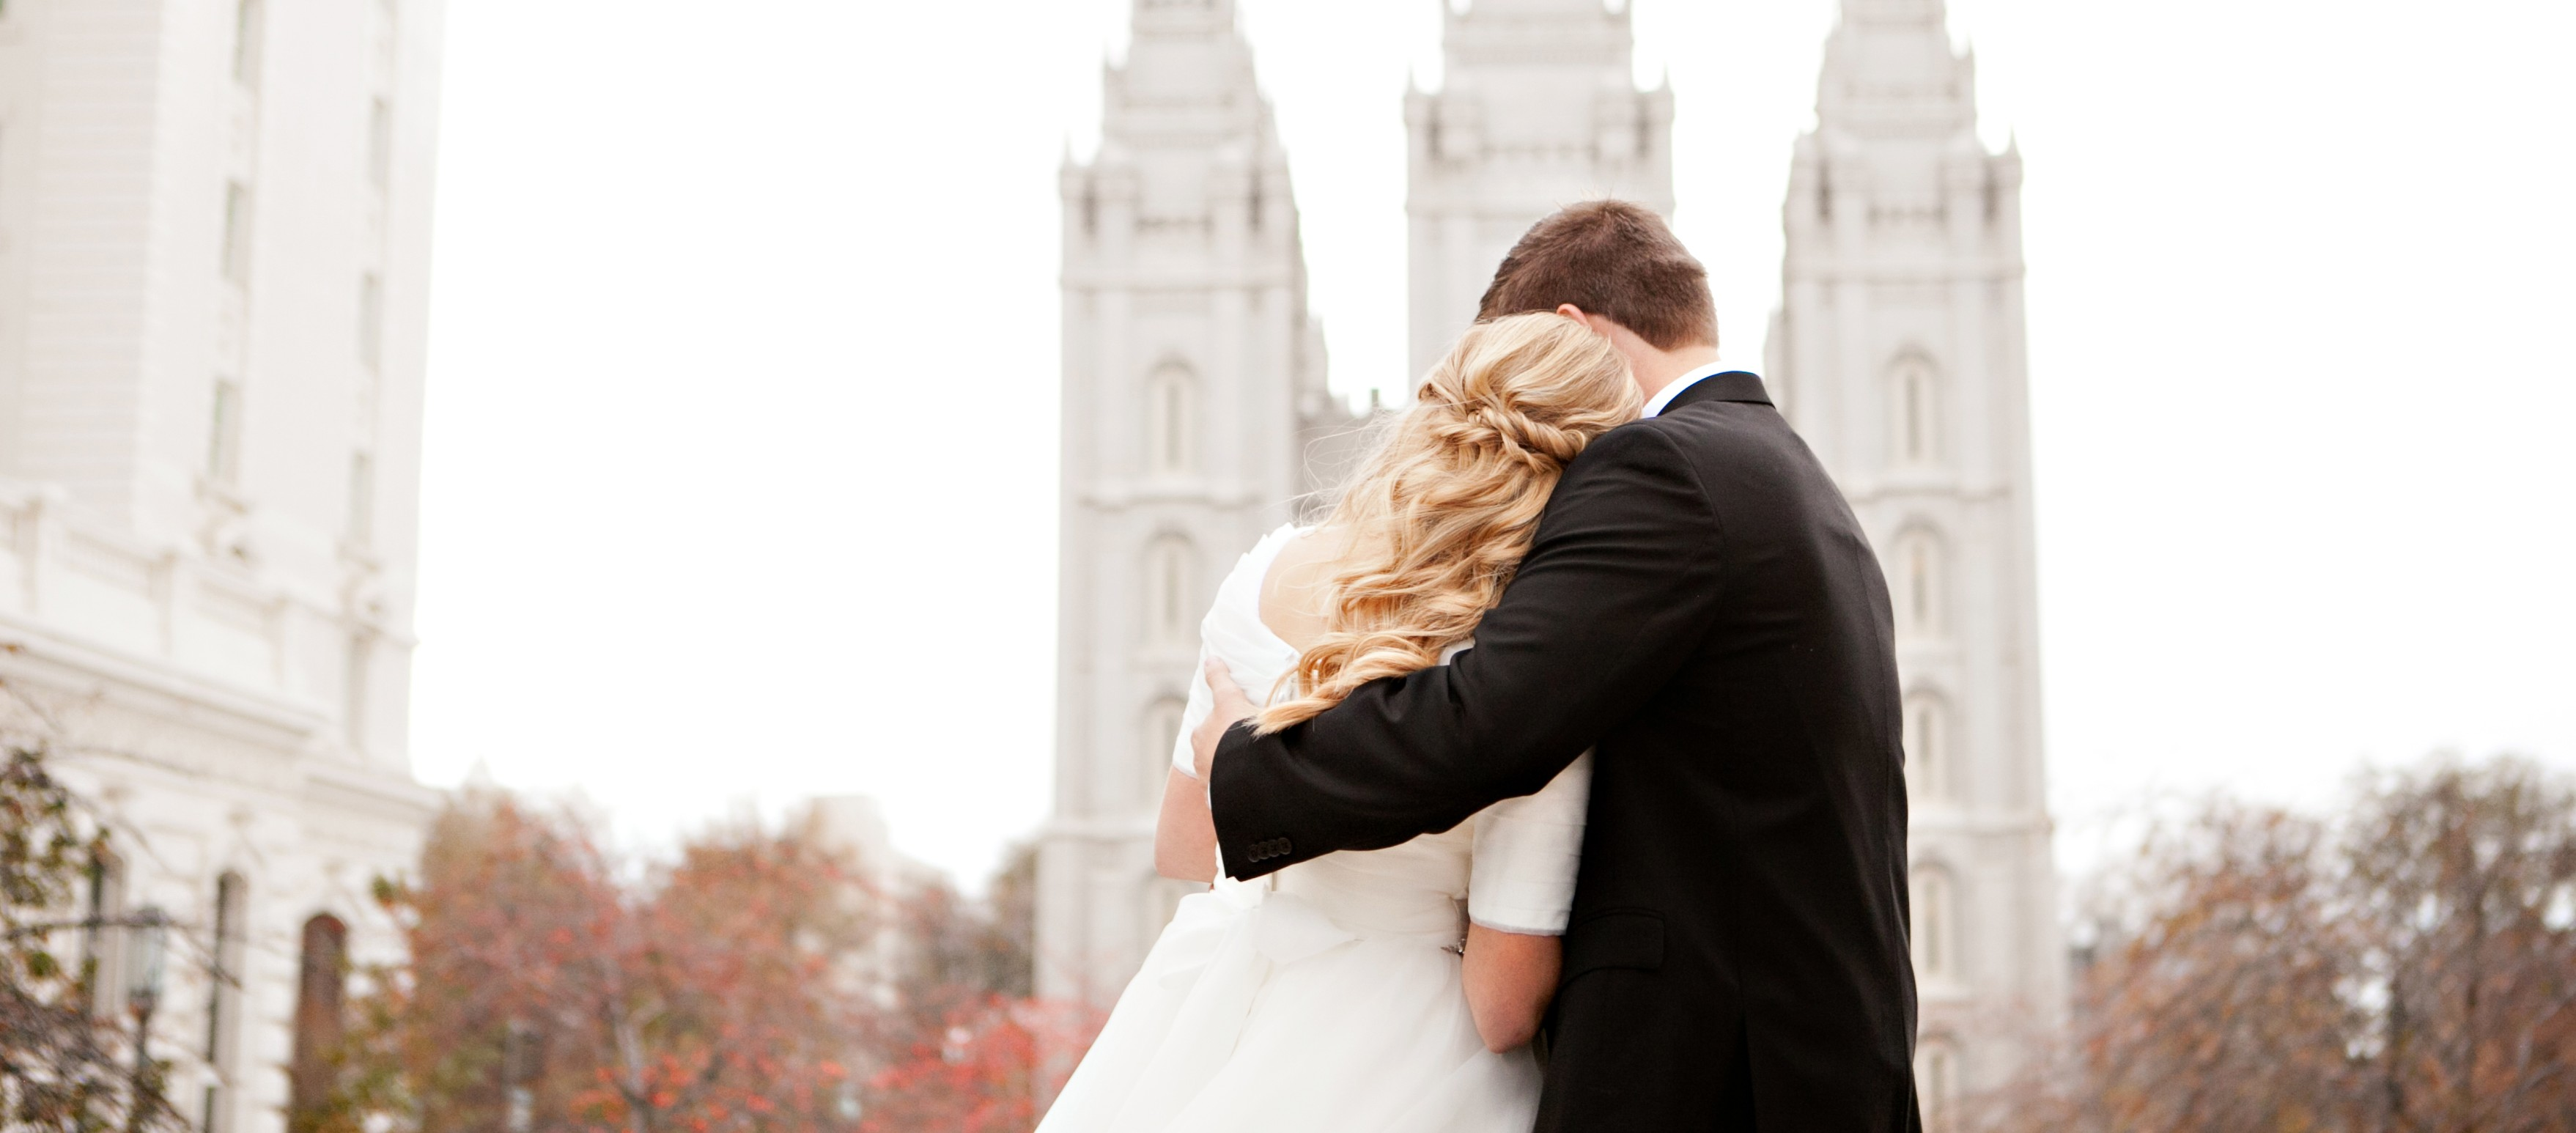 Matrimonio Tema Nord E Sud : Lo que defensores del matrimonio tradicional podrían estar